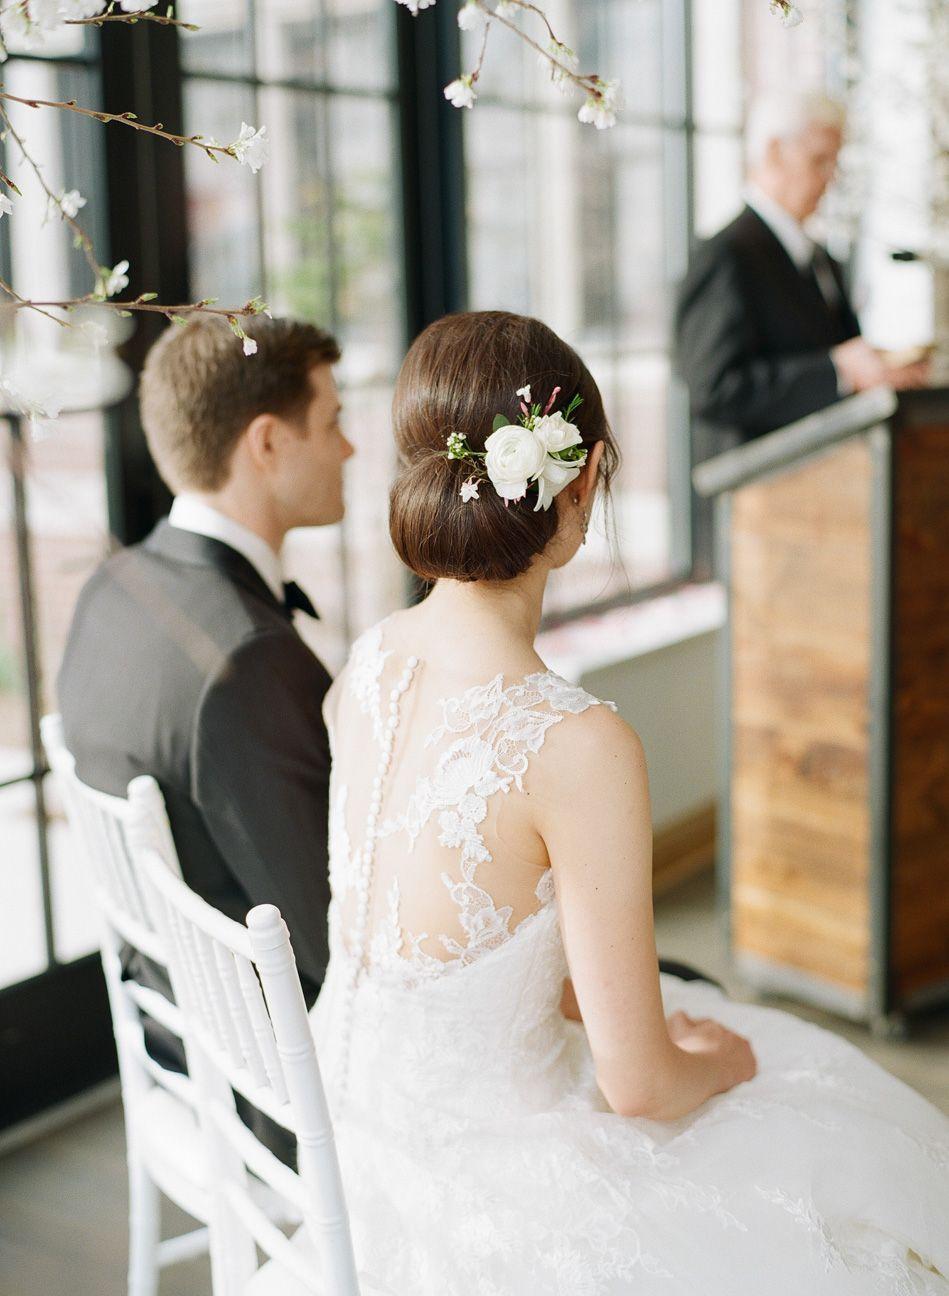 KarenHillPhotography-Zhu-Wedding-0461.jpg